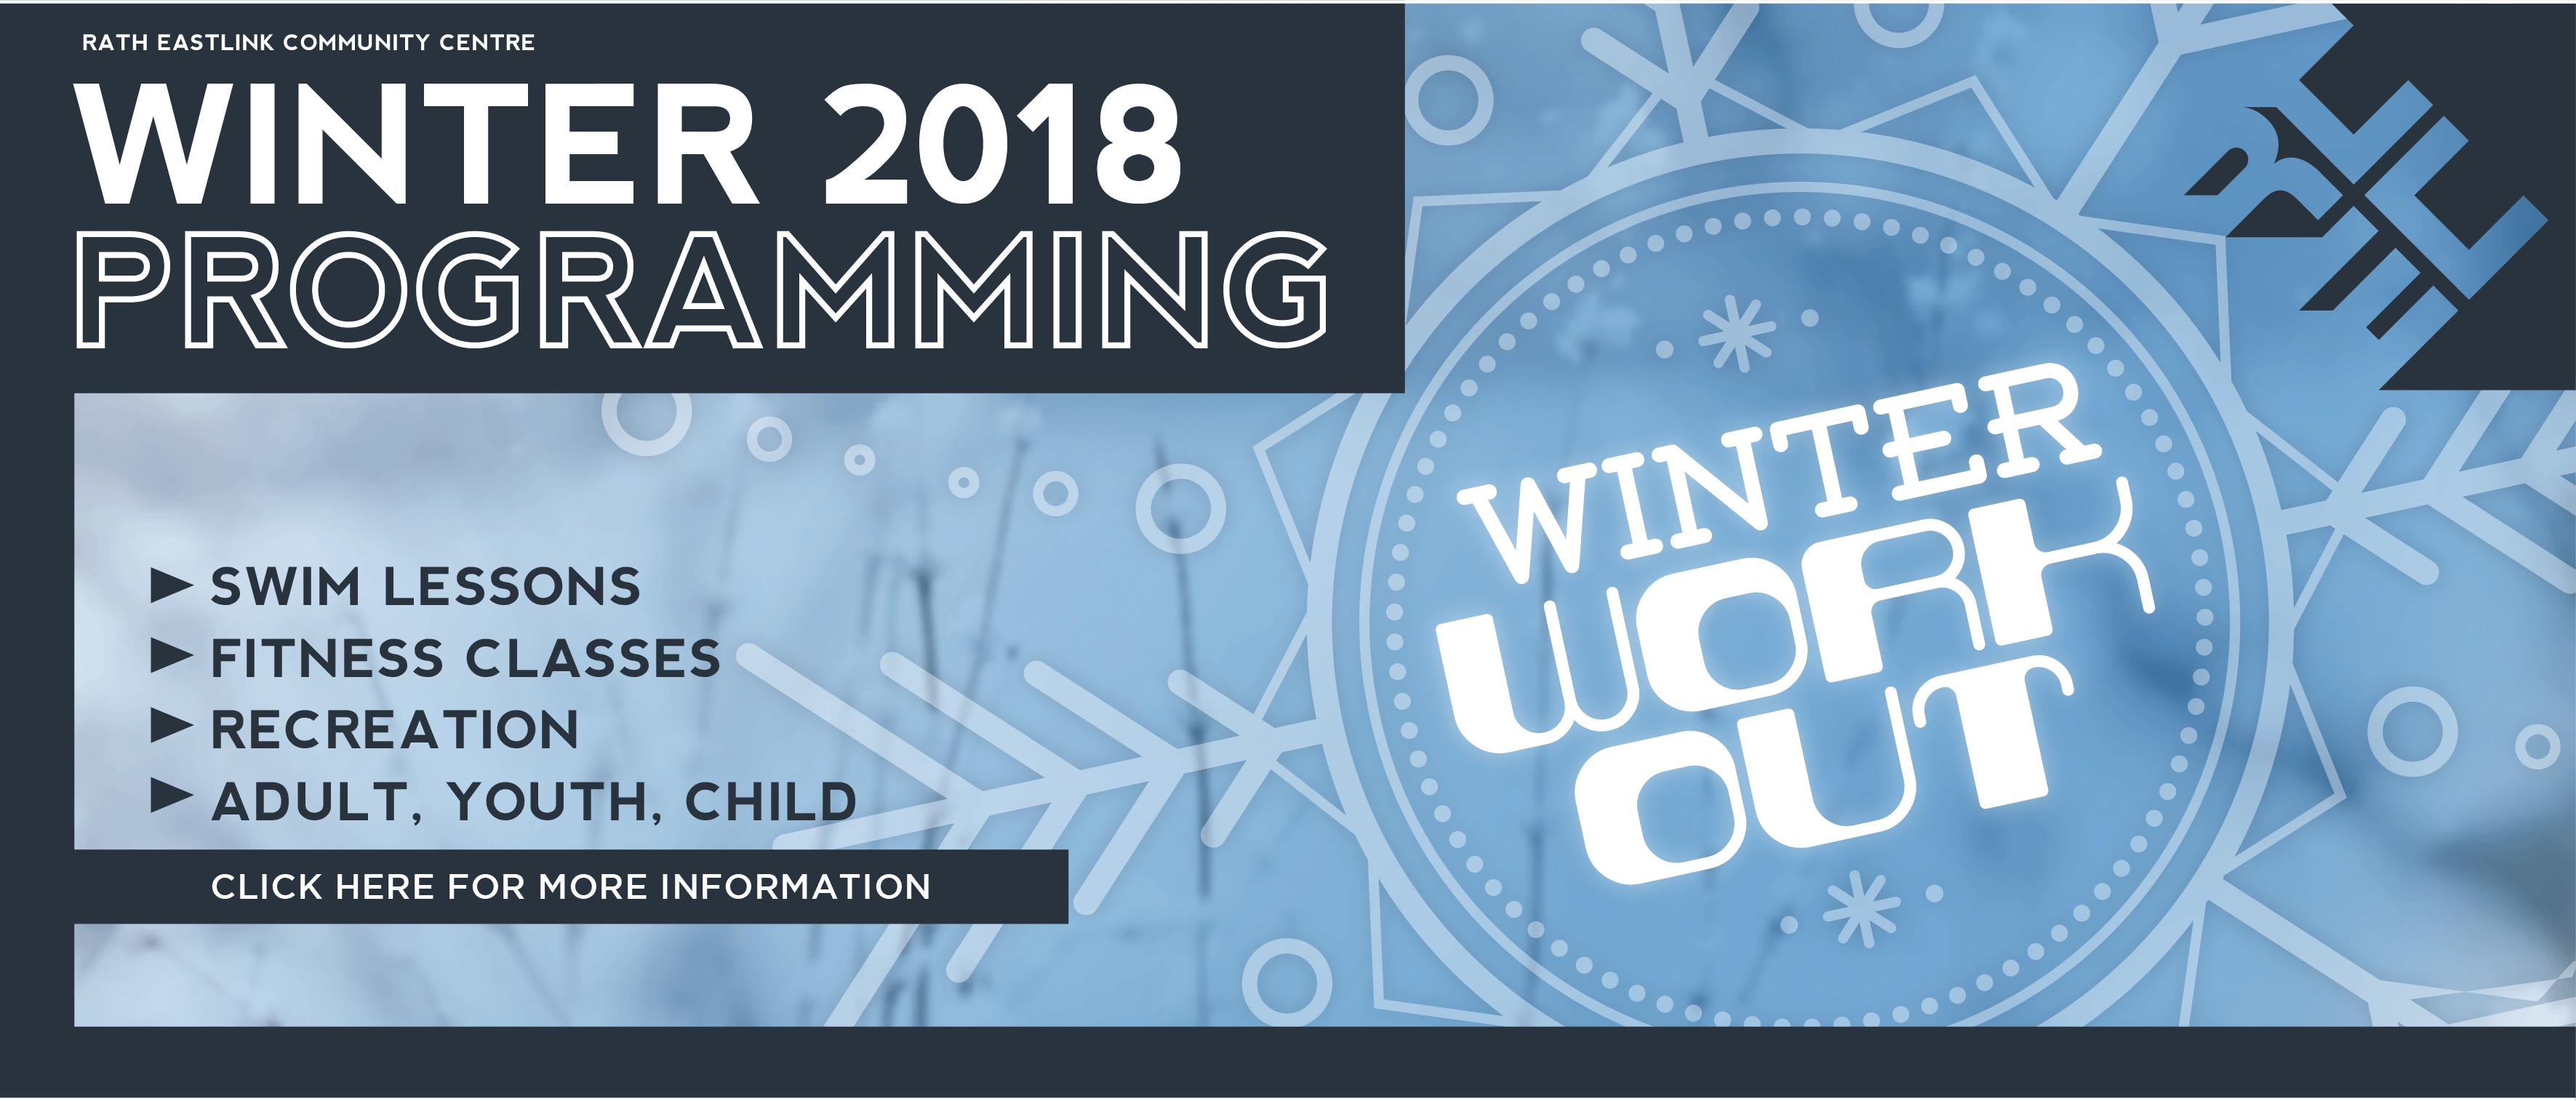 12-20-2017-Website-Slider-Winter-Programs